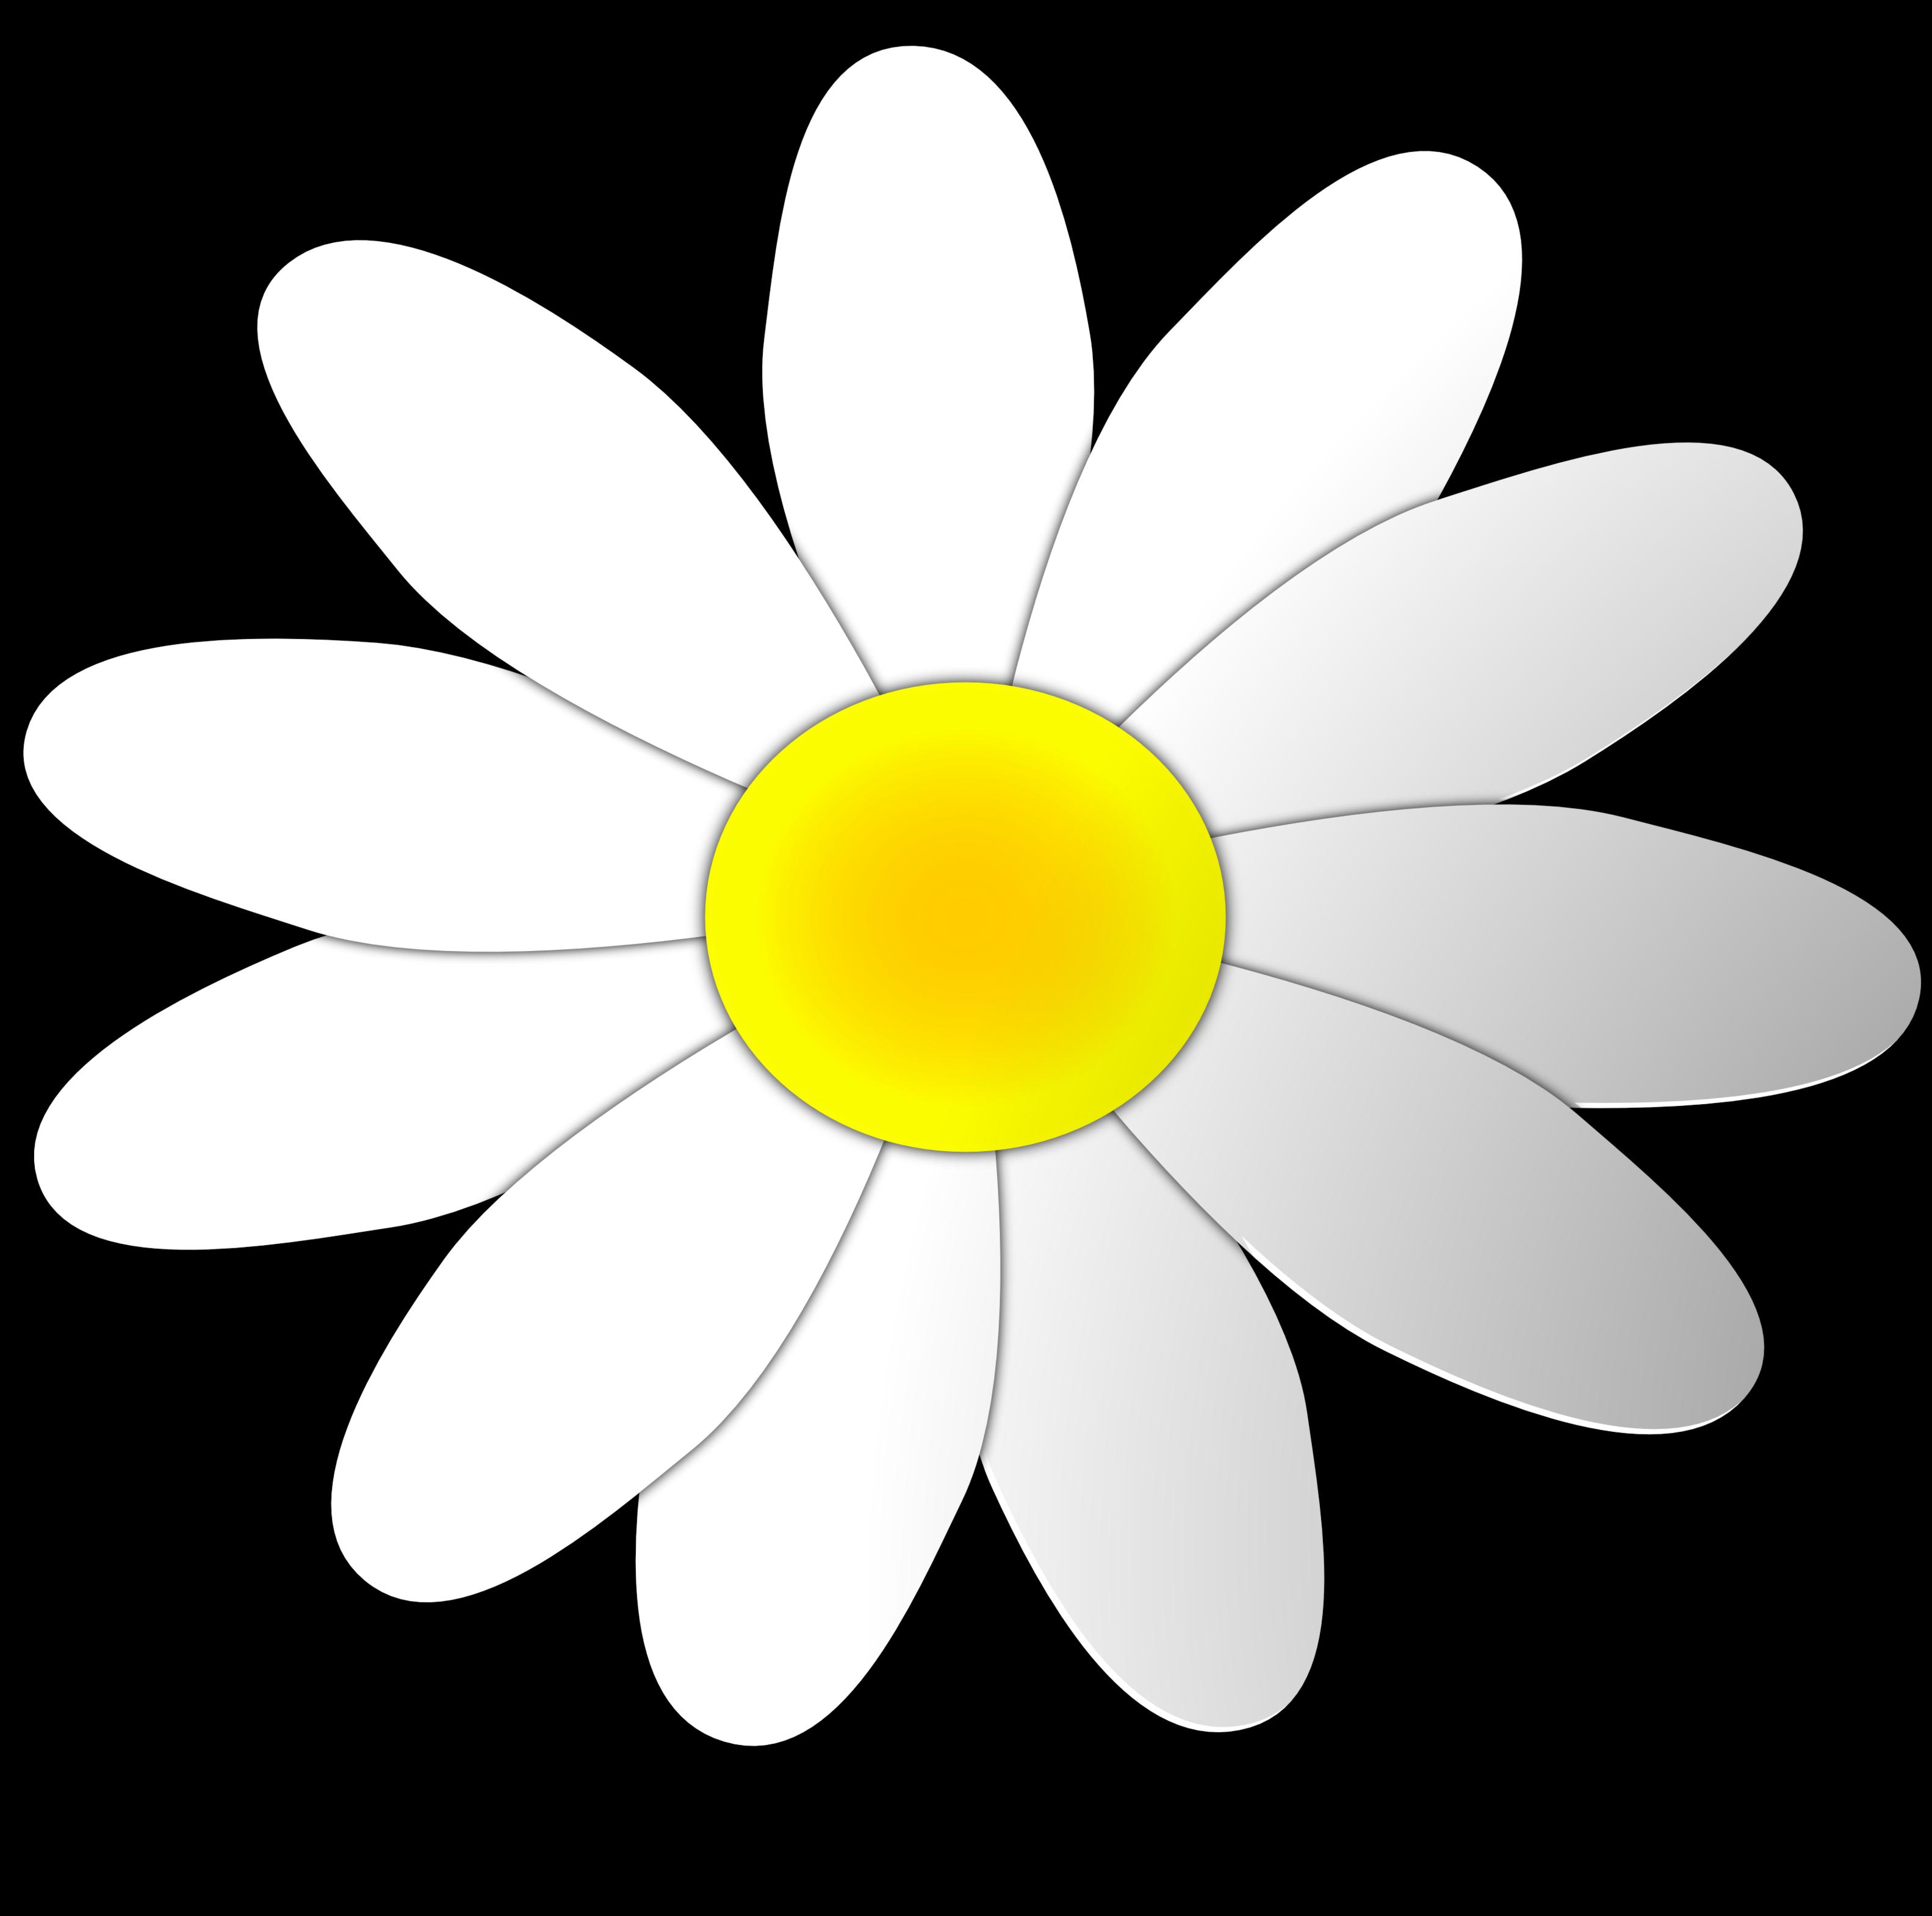 Coloured flower frames illustrations. Daisy clipart shasta daisy